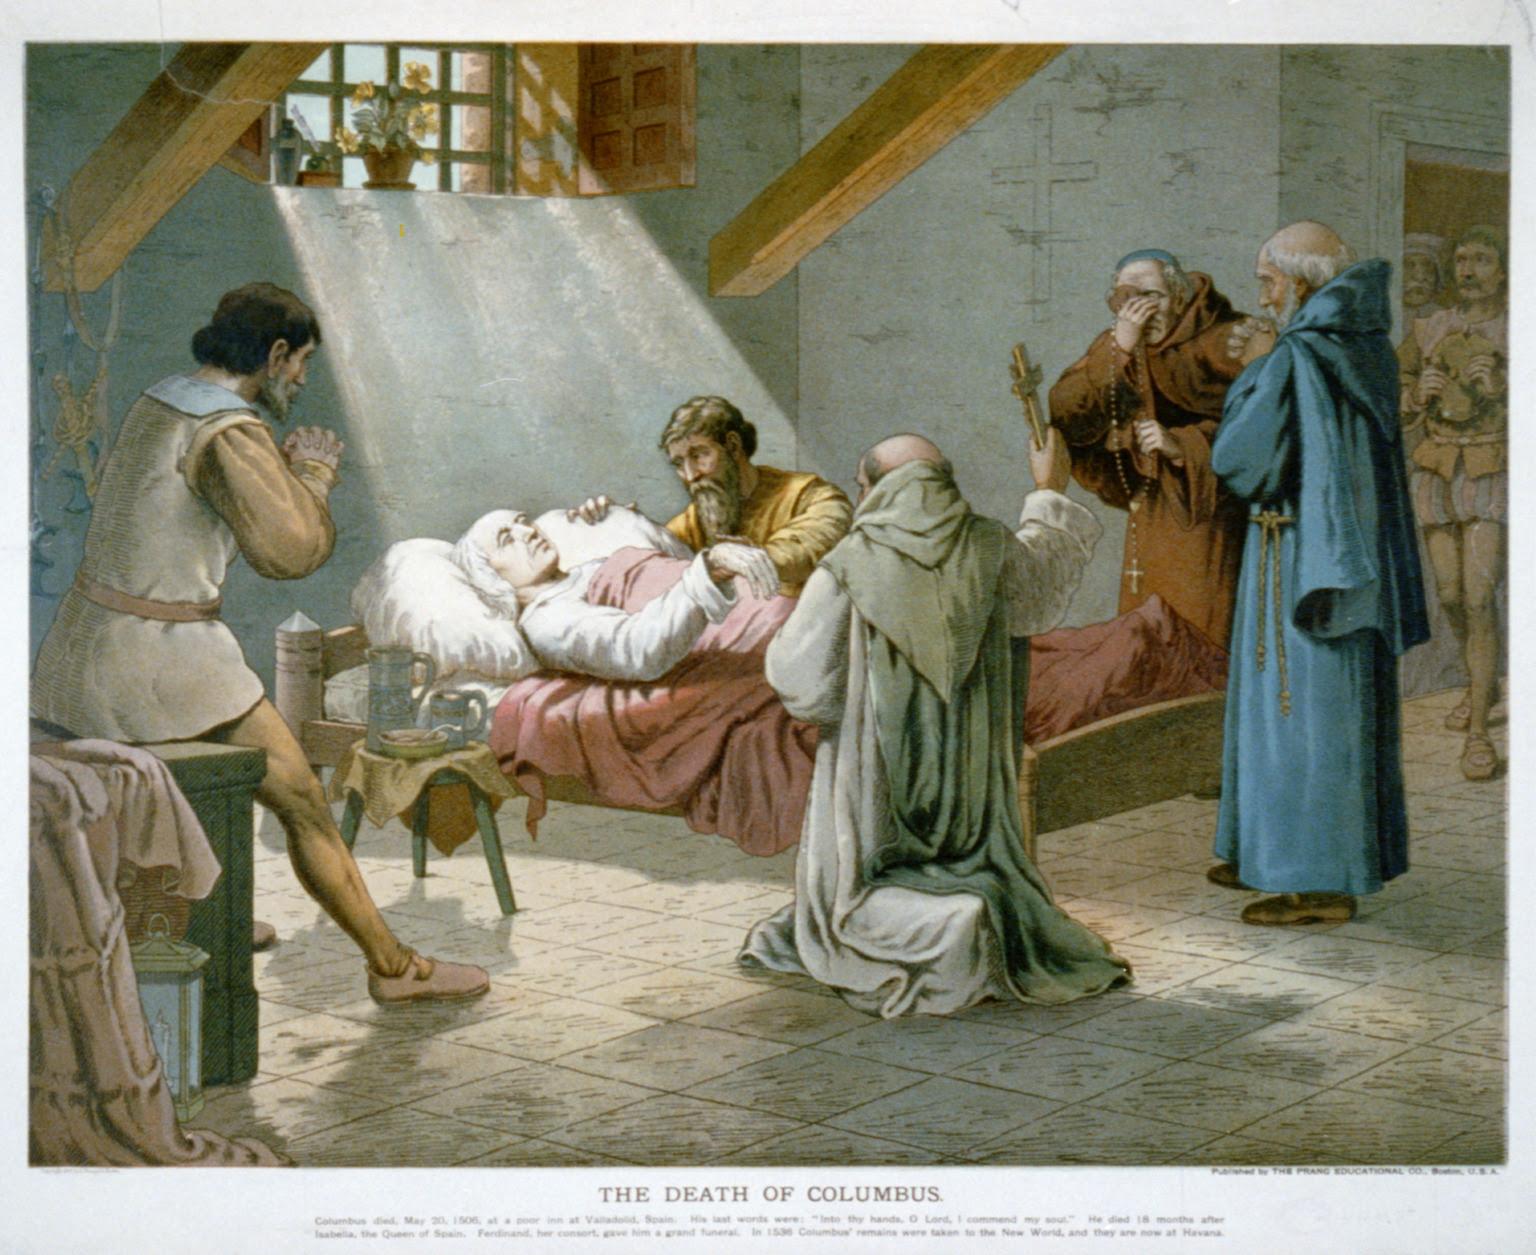 File:The death of Columbus.jpg